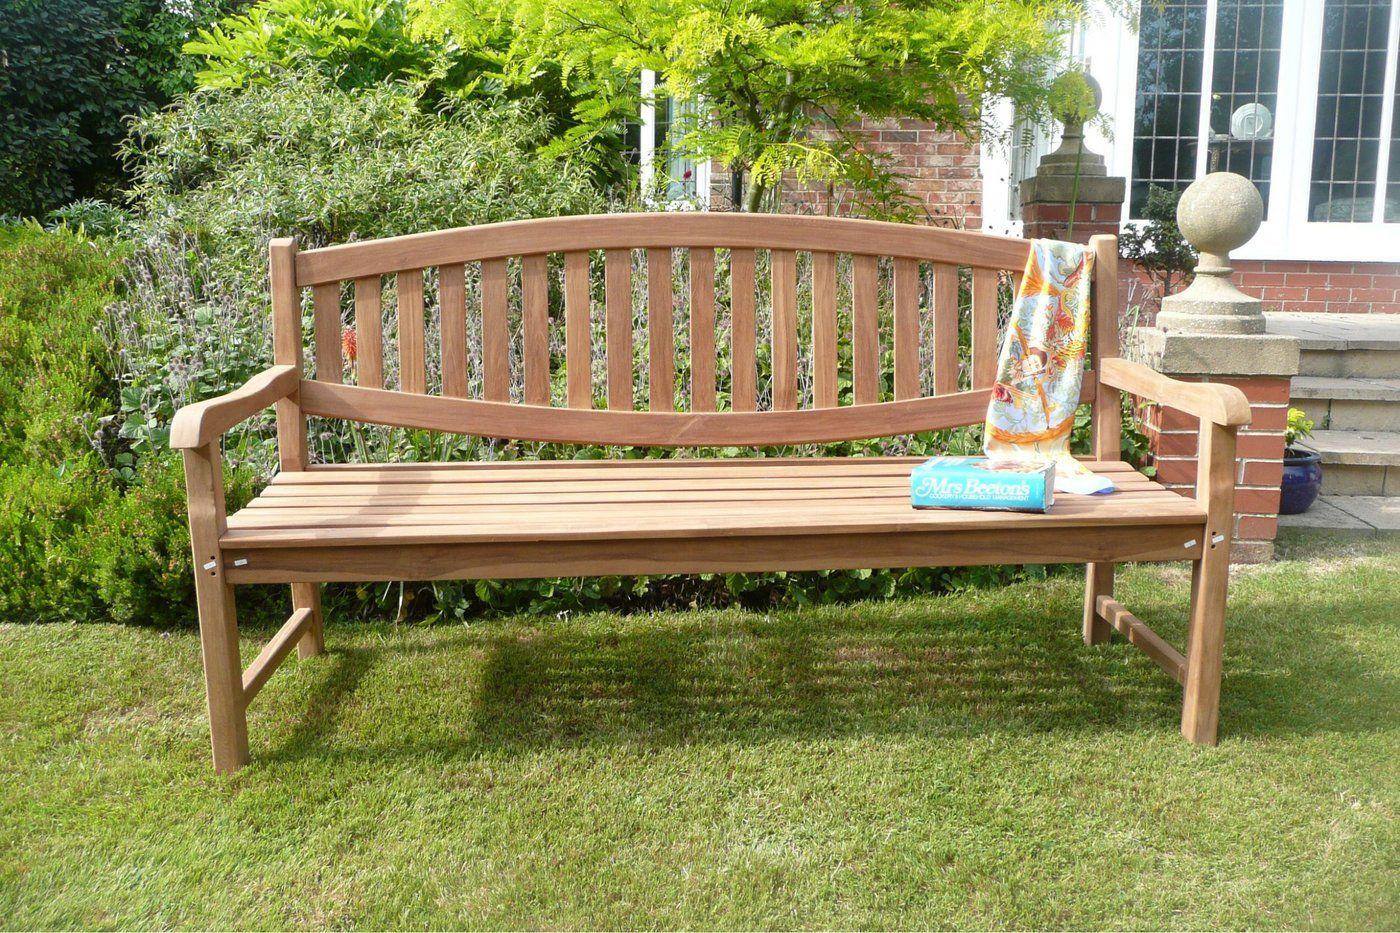 The Whitby Teak Garden Bench Teak Garden Bench Garden Furniture